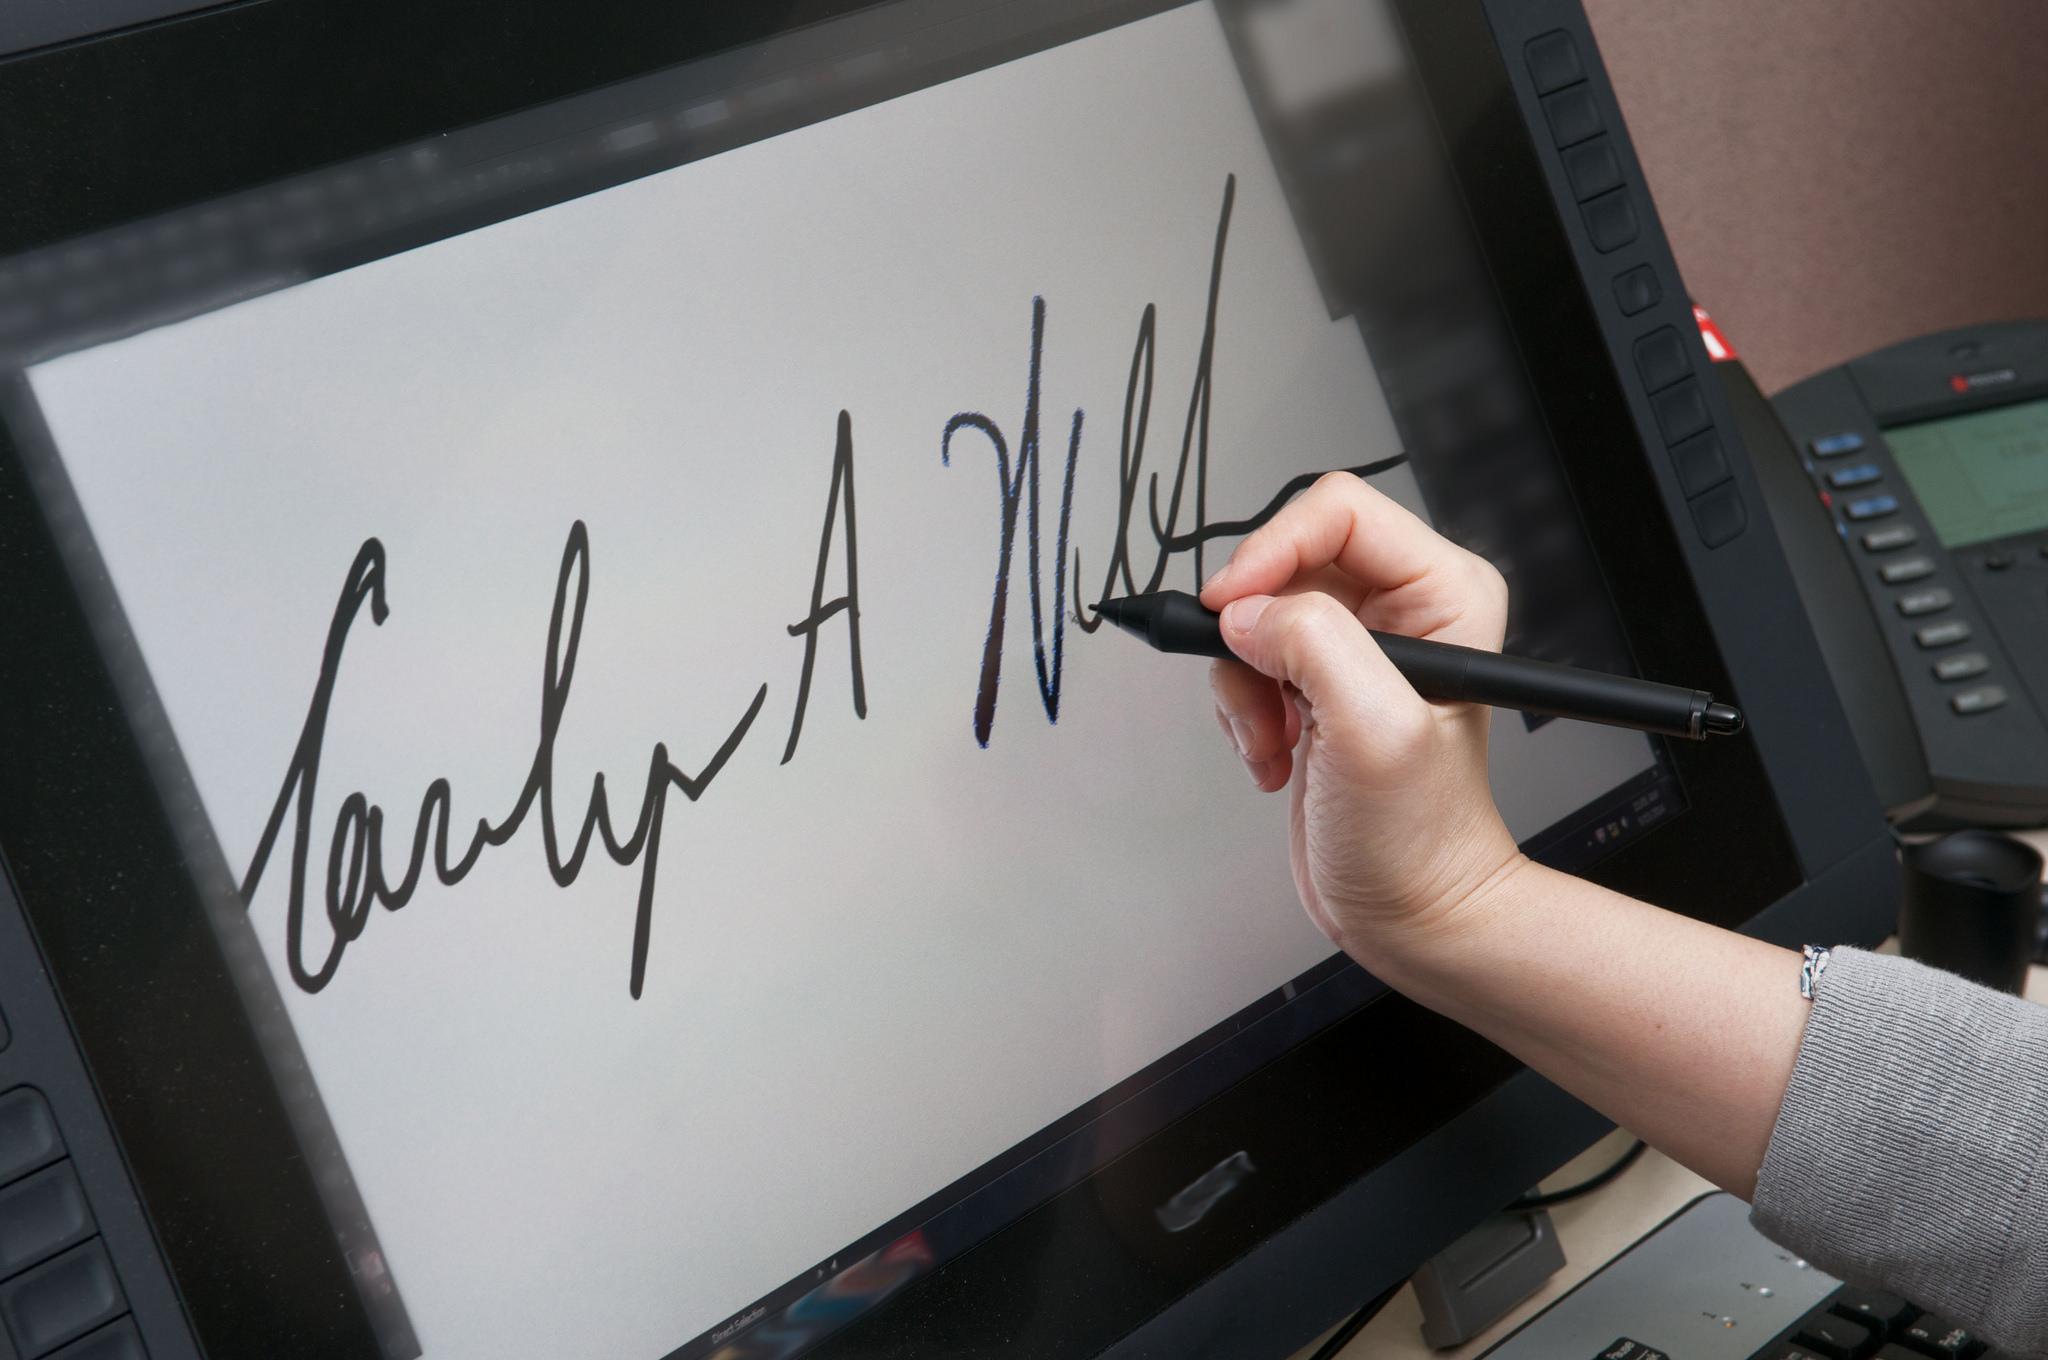 Senior Deputy Governor Carolyn Wilkins' signature goes digital as a designer prepares a bank note proof.